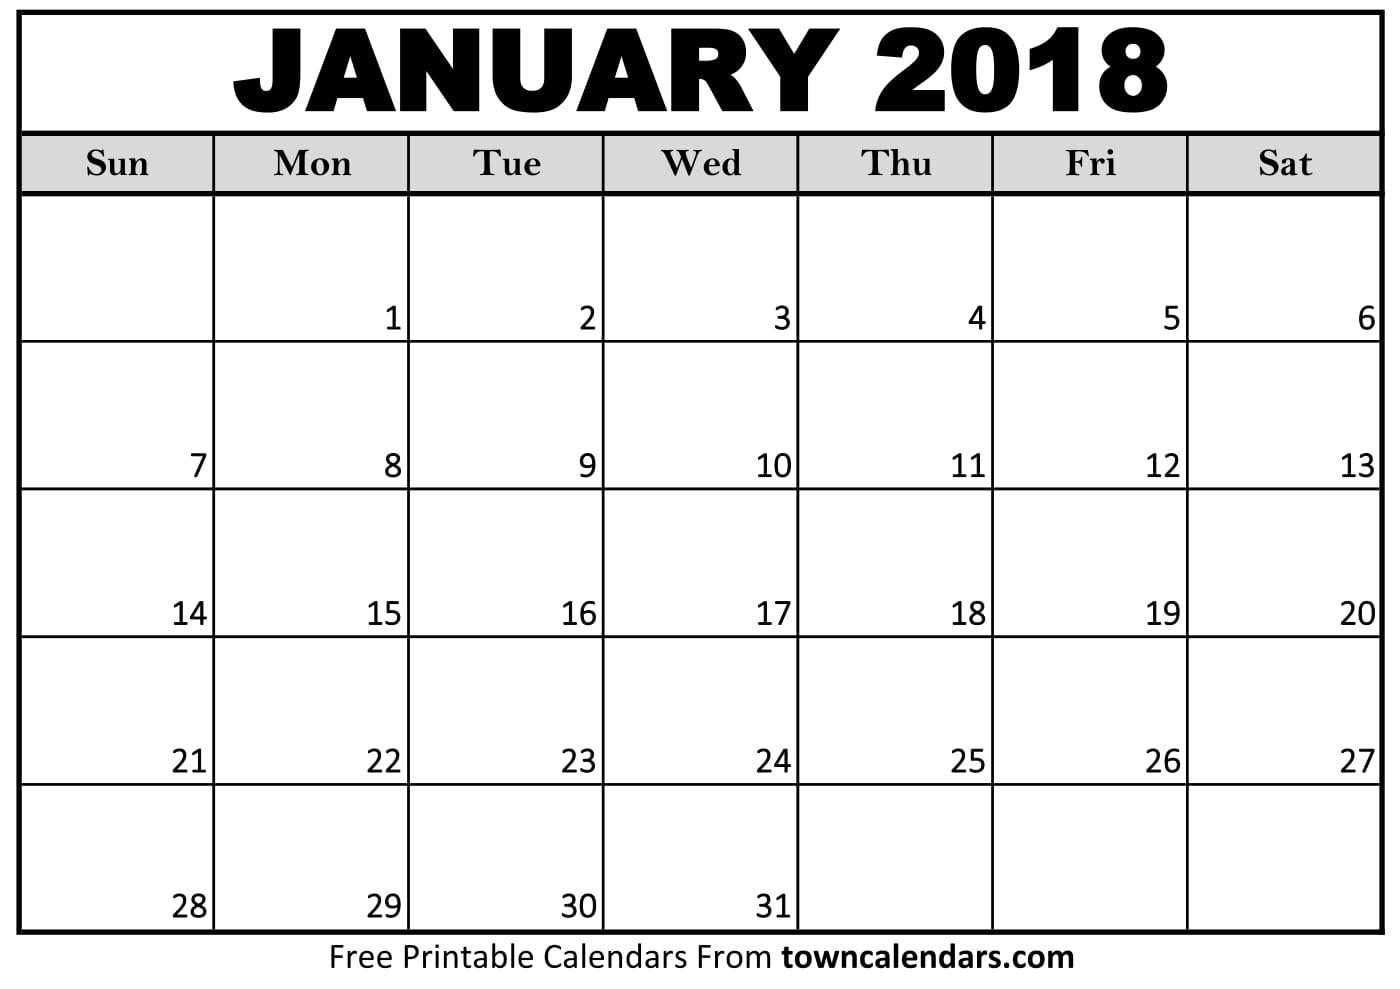 2018 Calendar Printable towncalendars